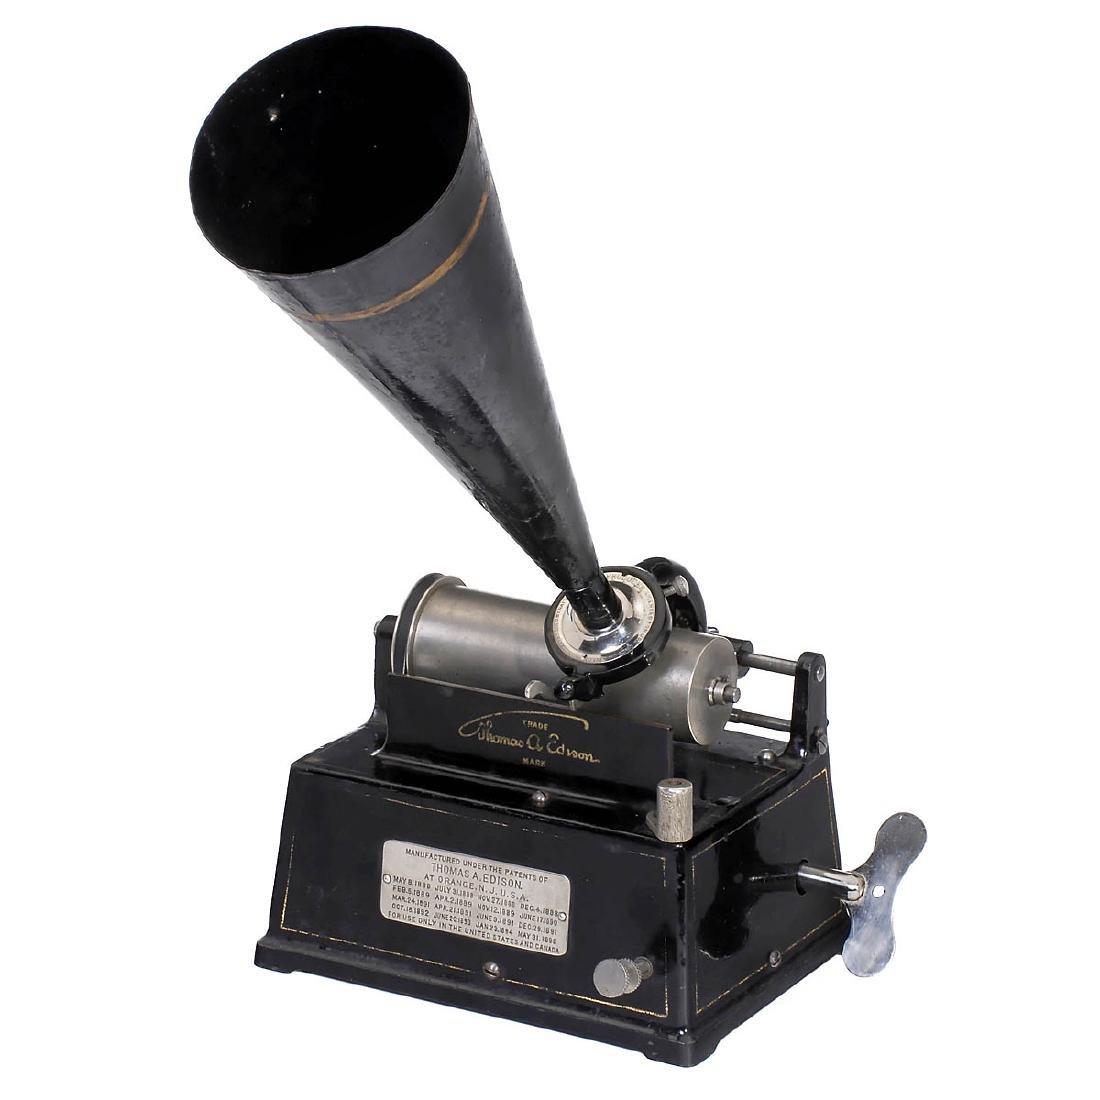 Edison Gem Model A Phonograph, c. 1900